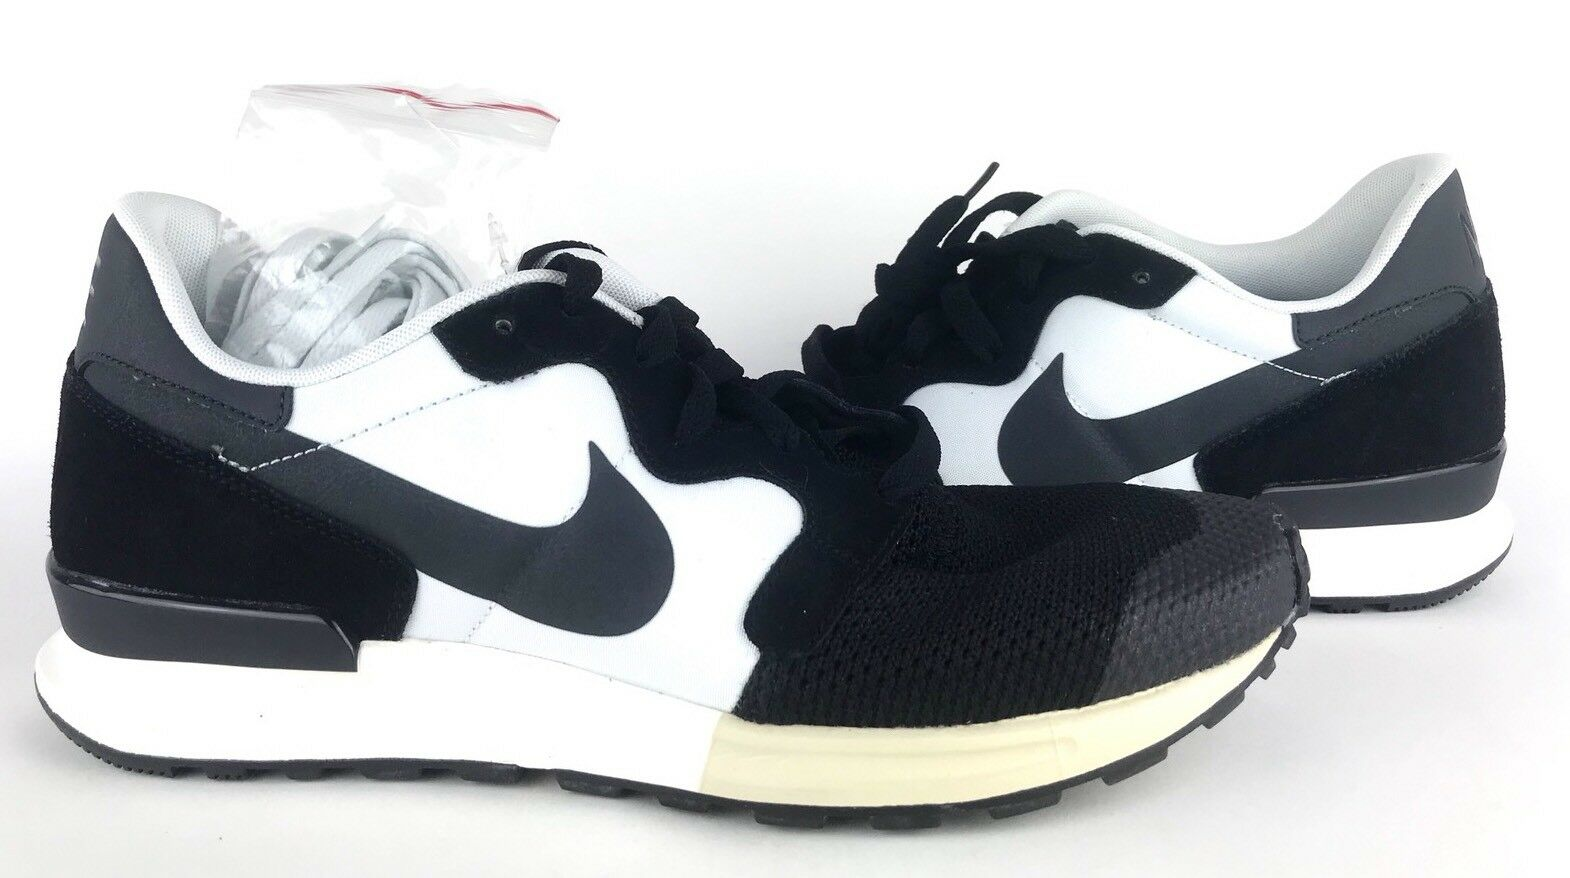 Nike Air Berwuda Retro With Shoe Bag Black White 555305-003 Size 10